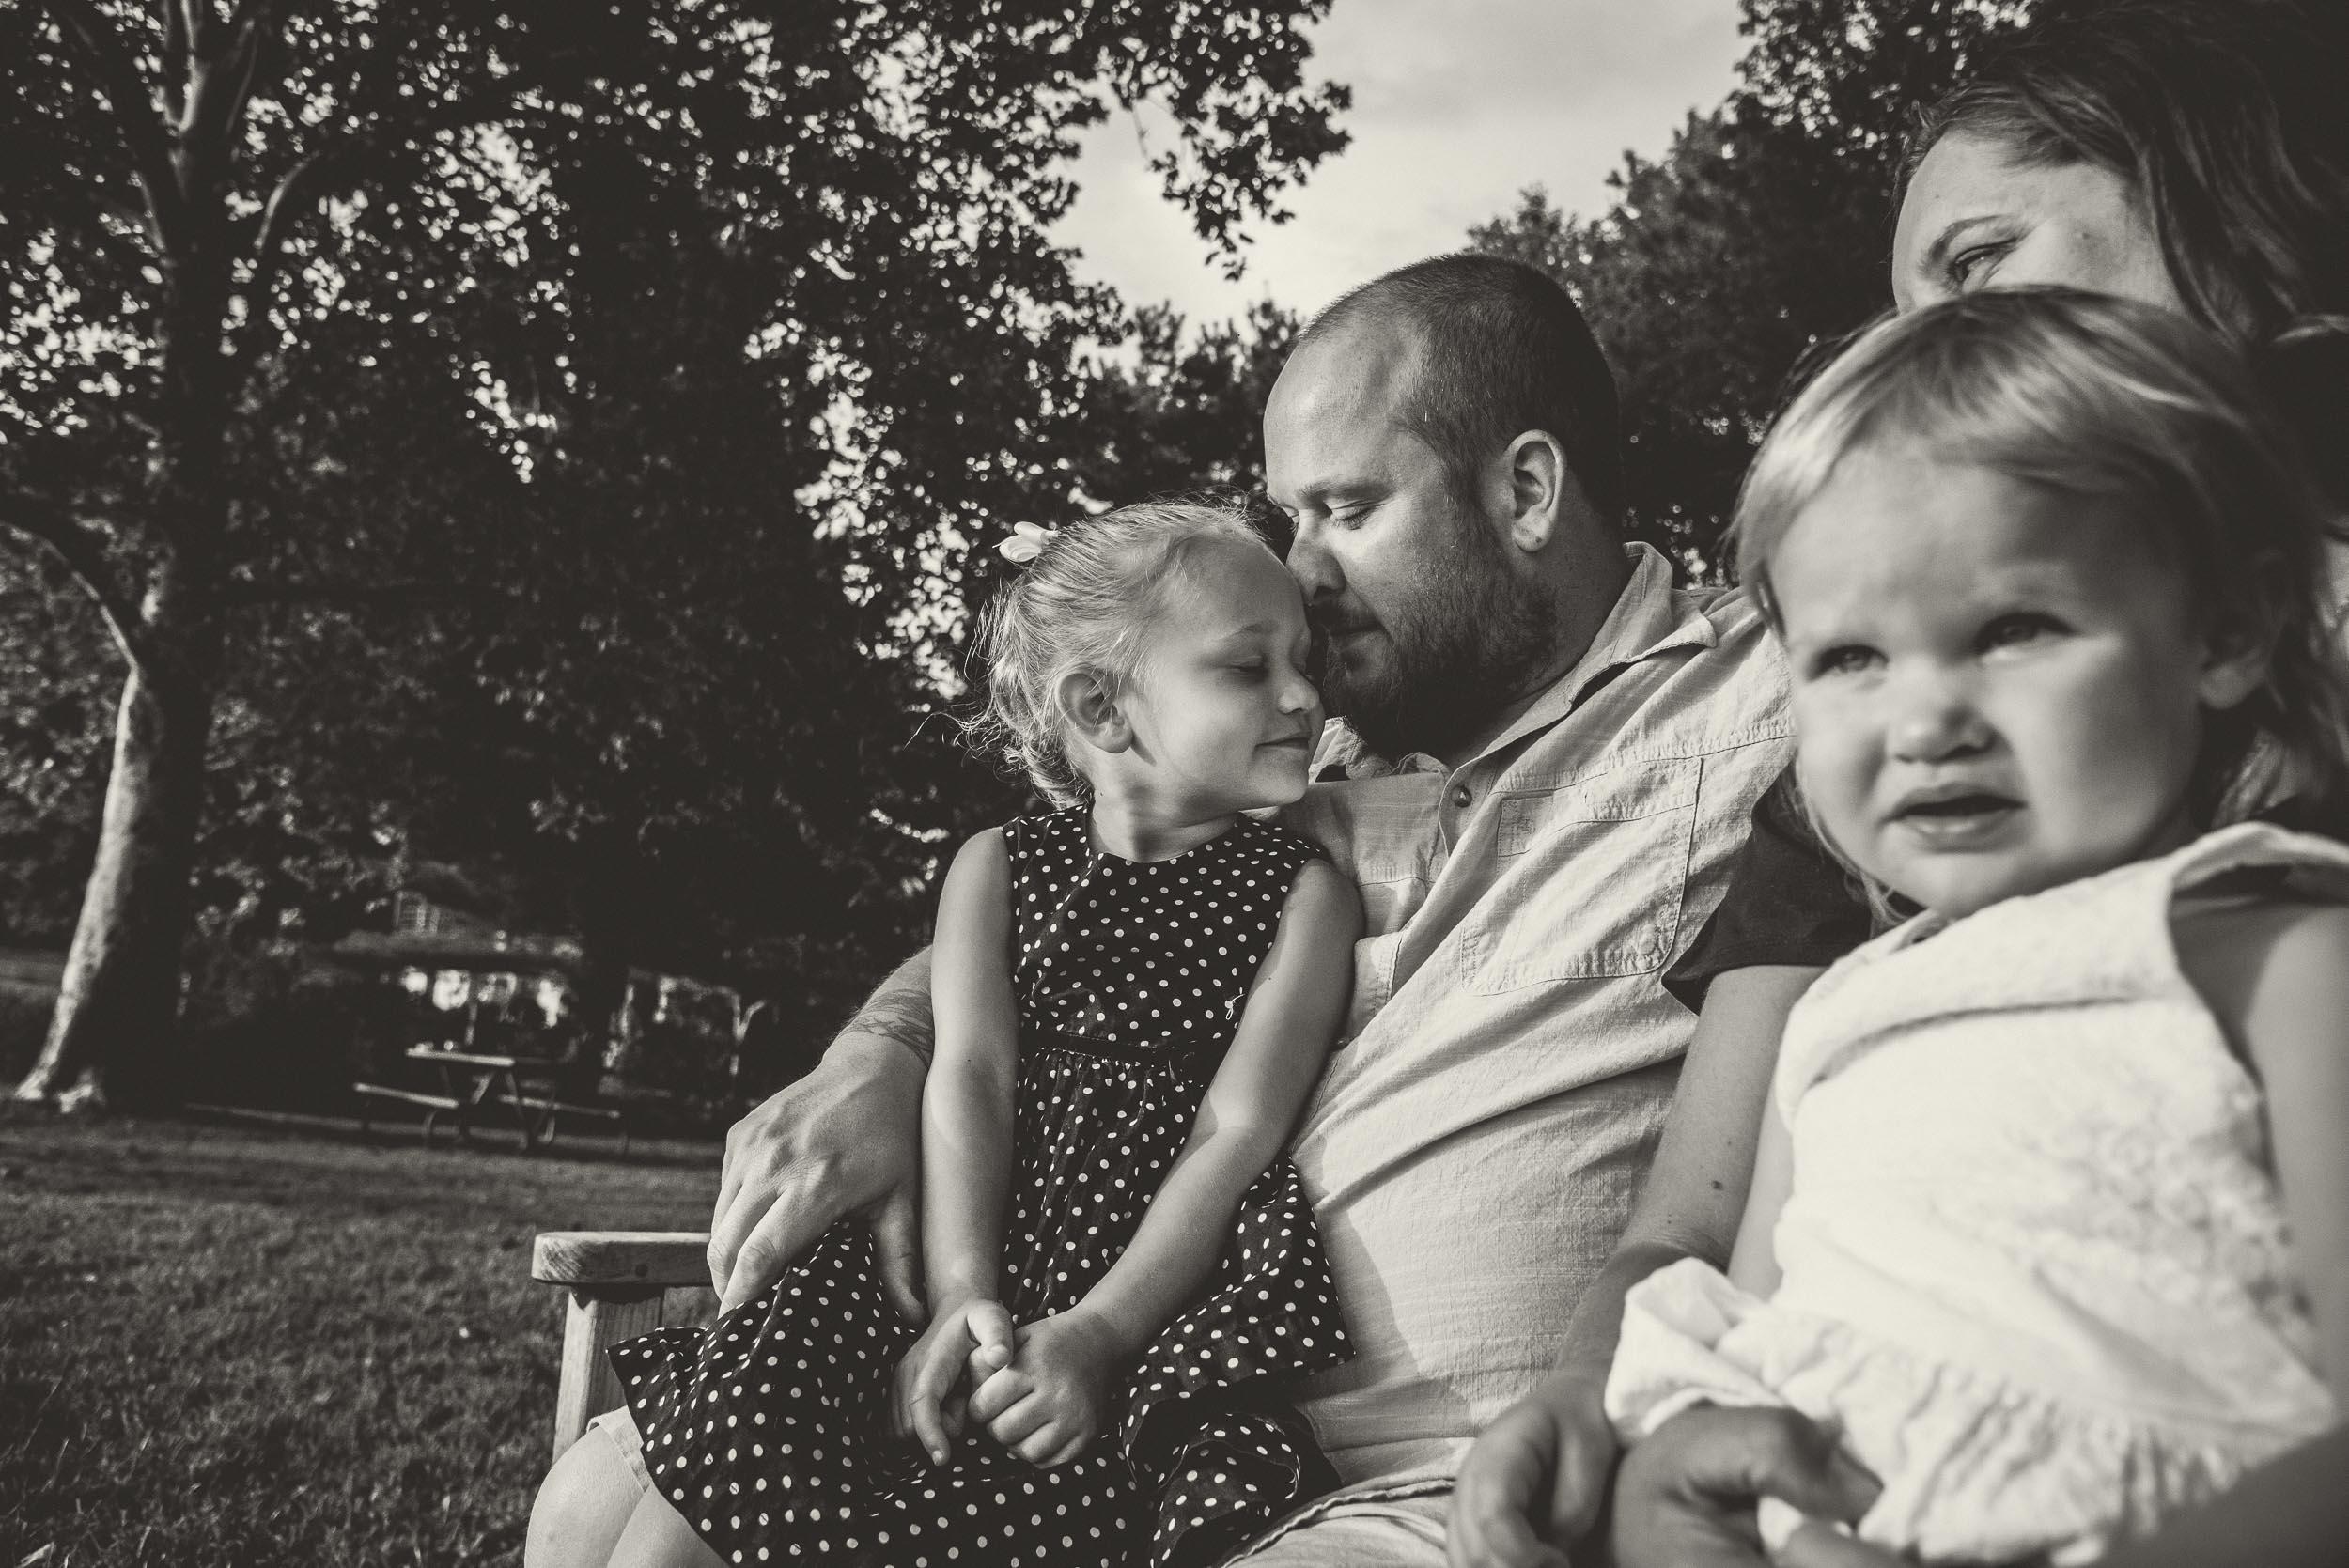 Family_Senior_Wedding_Maryland_Photographer_Sonny_and_Allison_Favorites_Easton_Crofton_Oxford-31.jpg